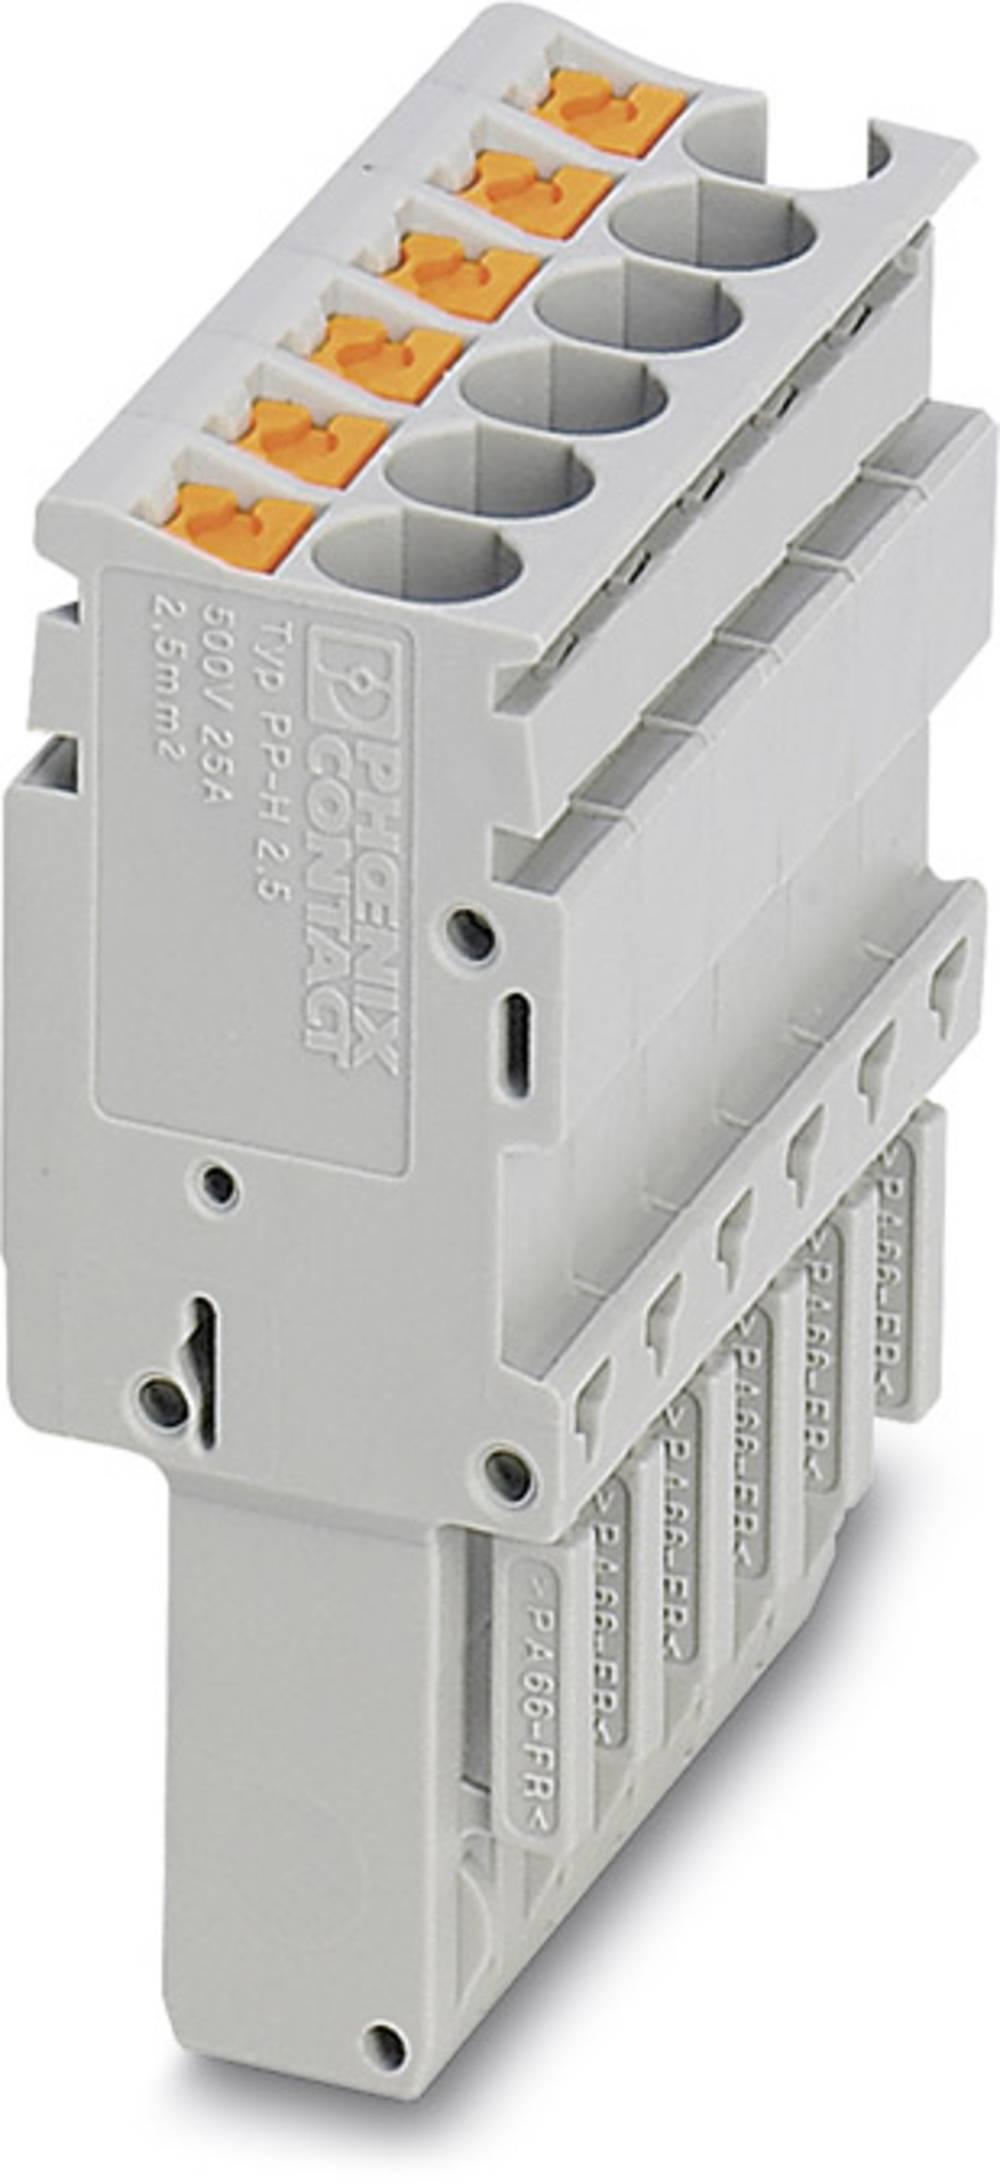 Plug PP-H 2,5 / 11 Phoenix Contact PP-H 2,5/11 Grå 10 stk